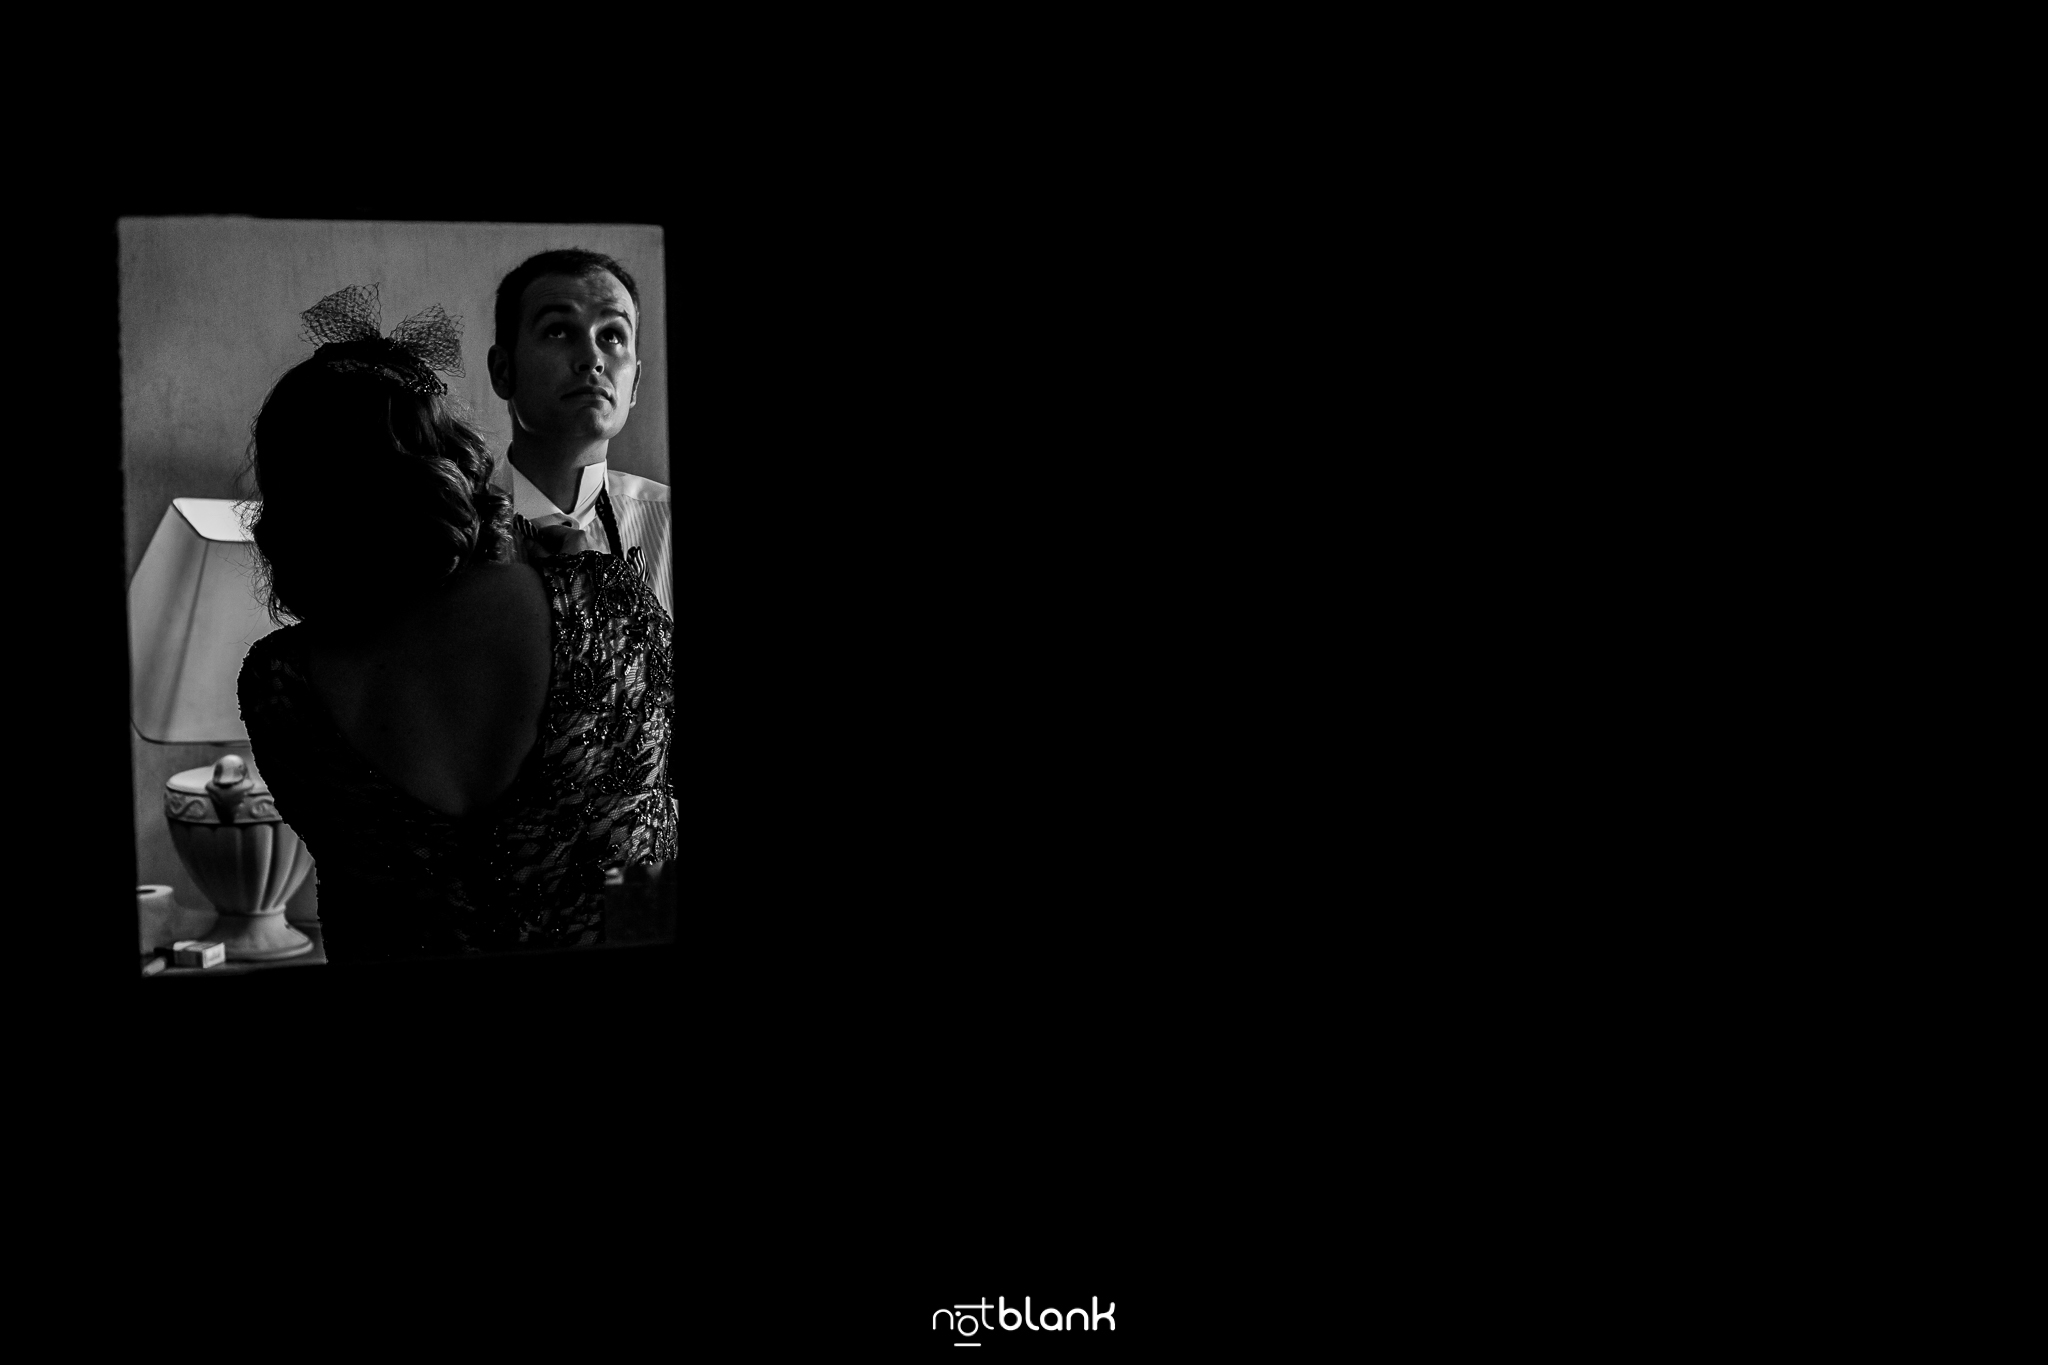 Notblank-Boda Tematica-Star Wars-Malaposta-Portugal-Fotógrafo de boda-Corbata-Preparativos-Madre-Madrina